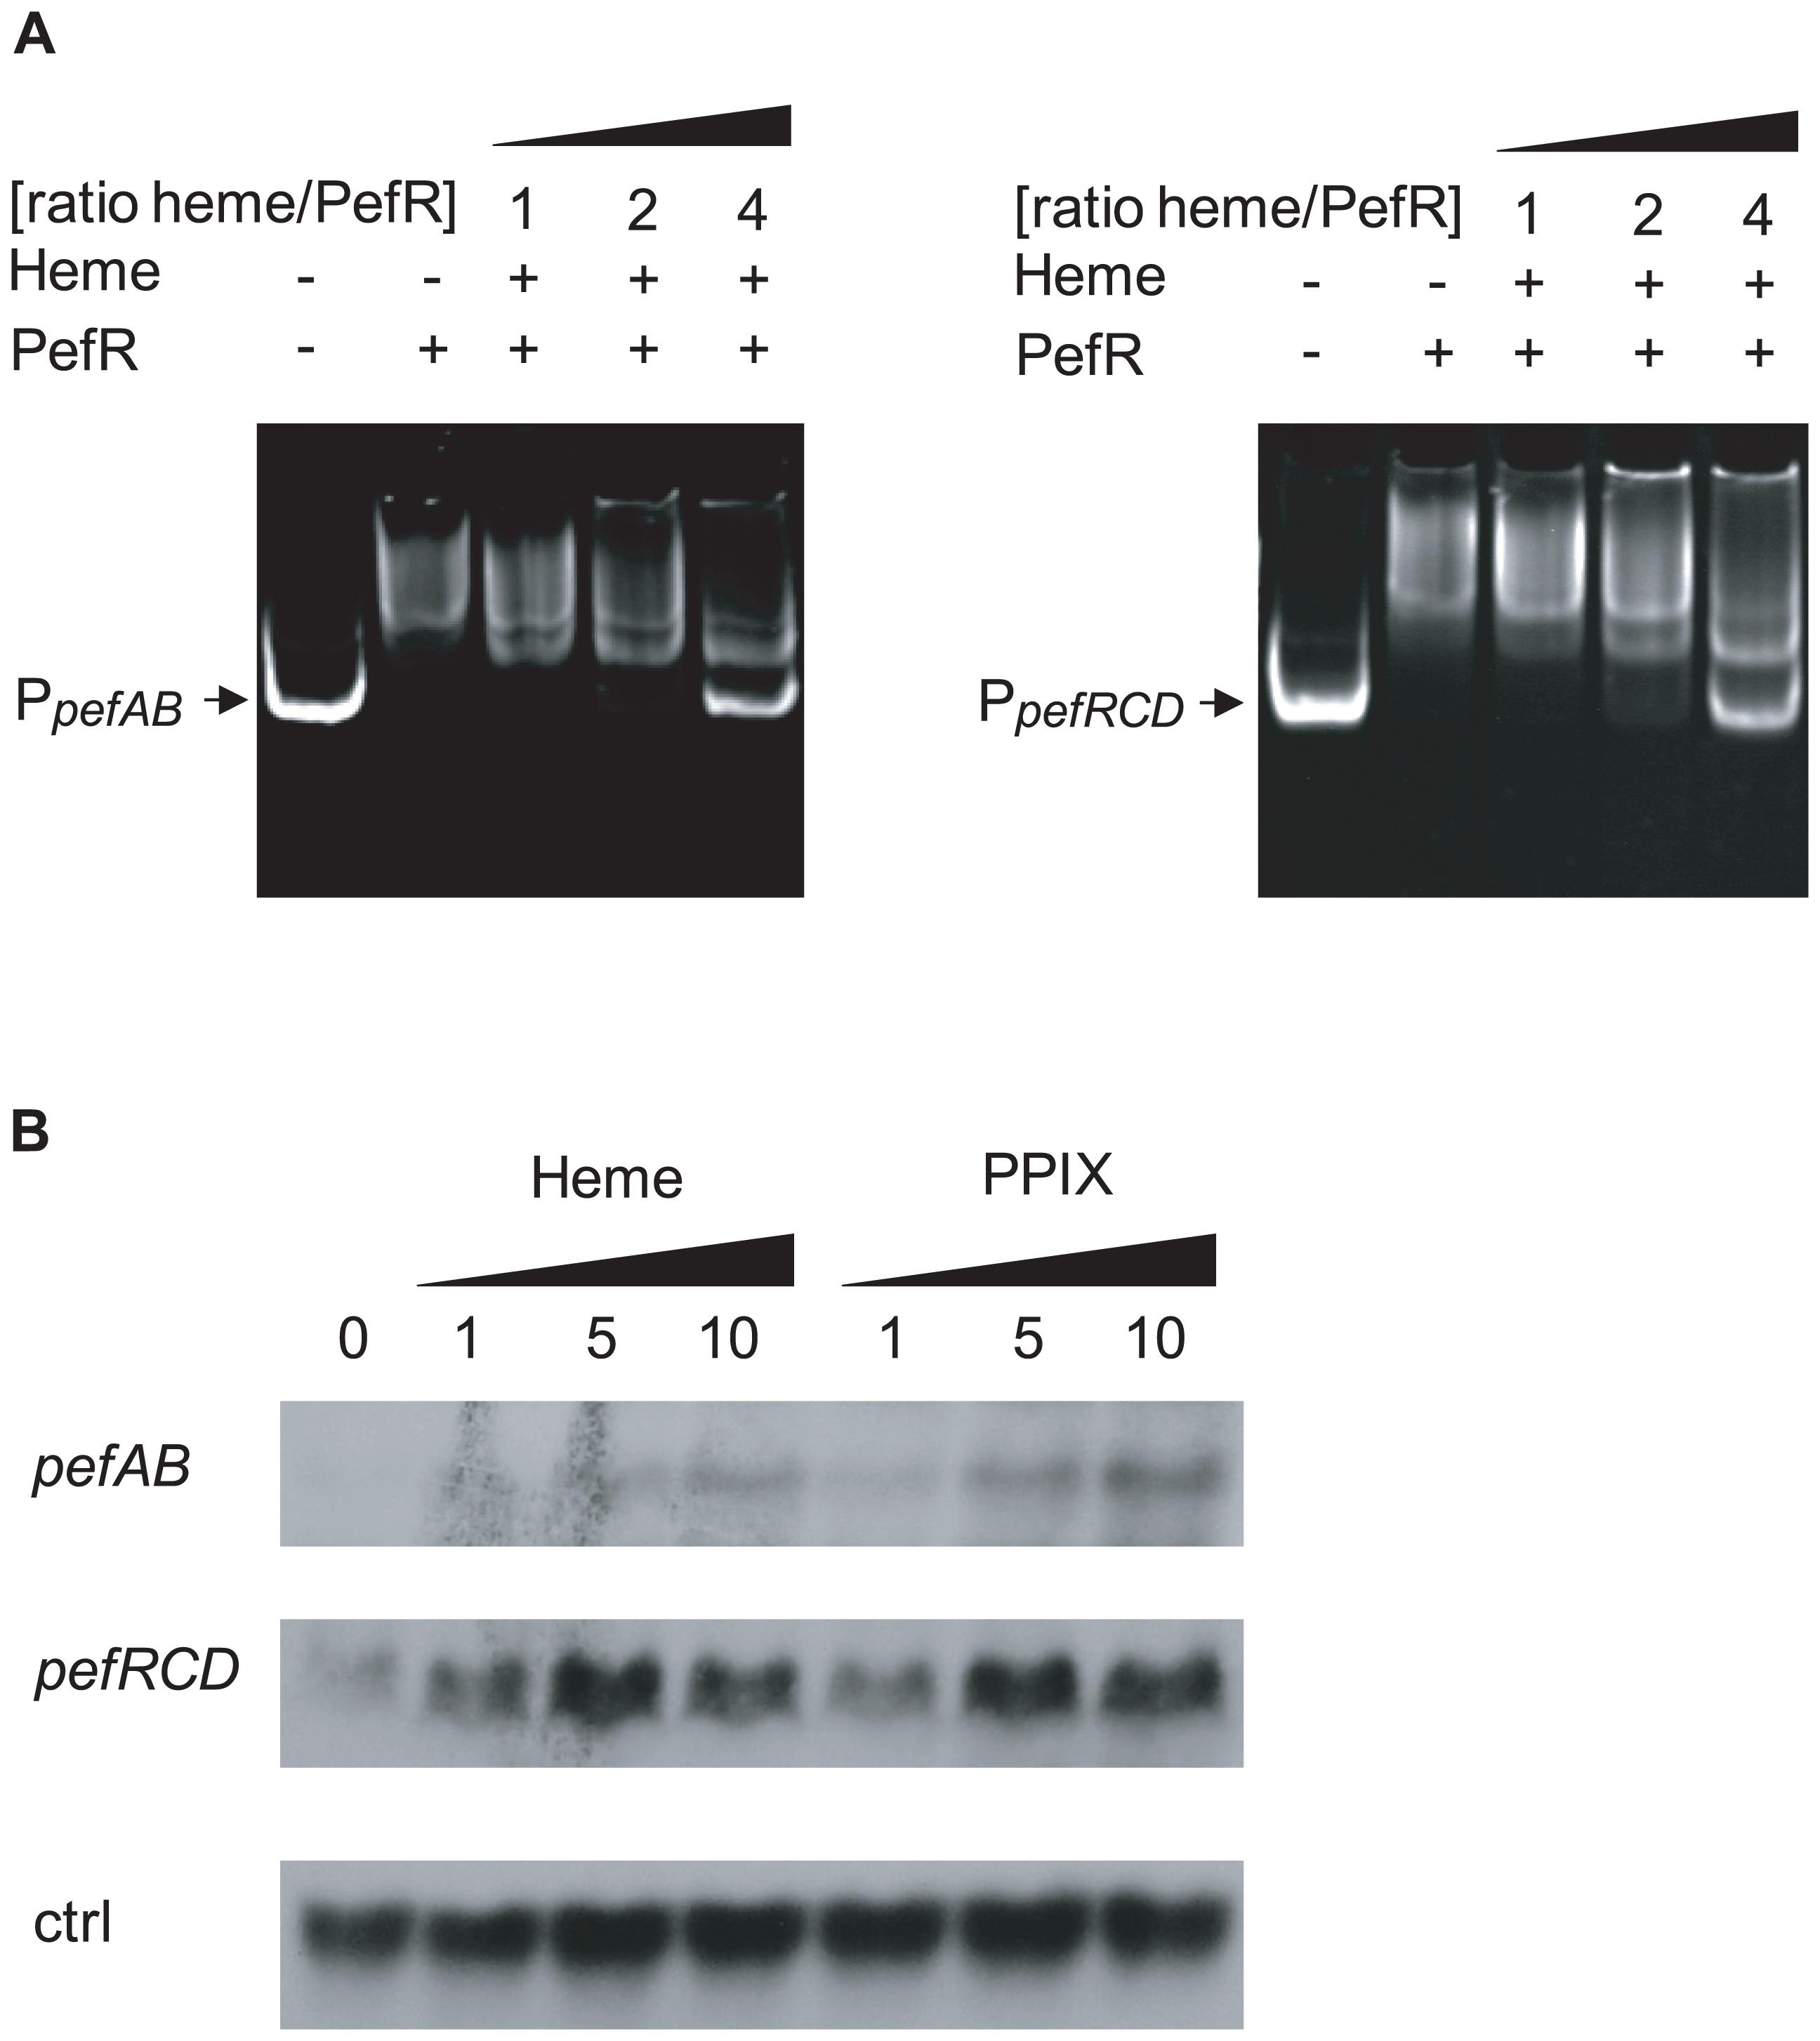 PefR is a heme- and PPIX-modulated repressor of <i>pefAB</i> and <i>pefRCD</i> loci.